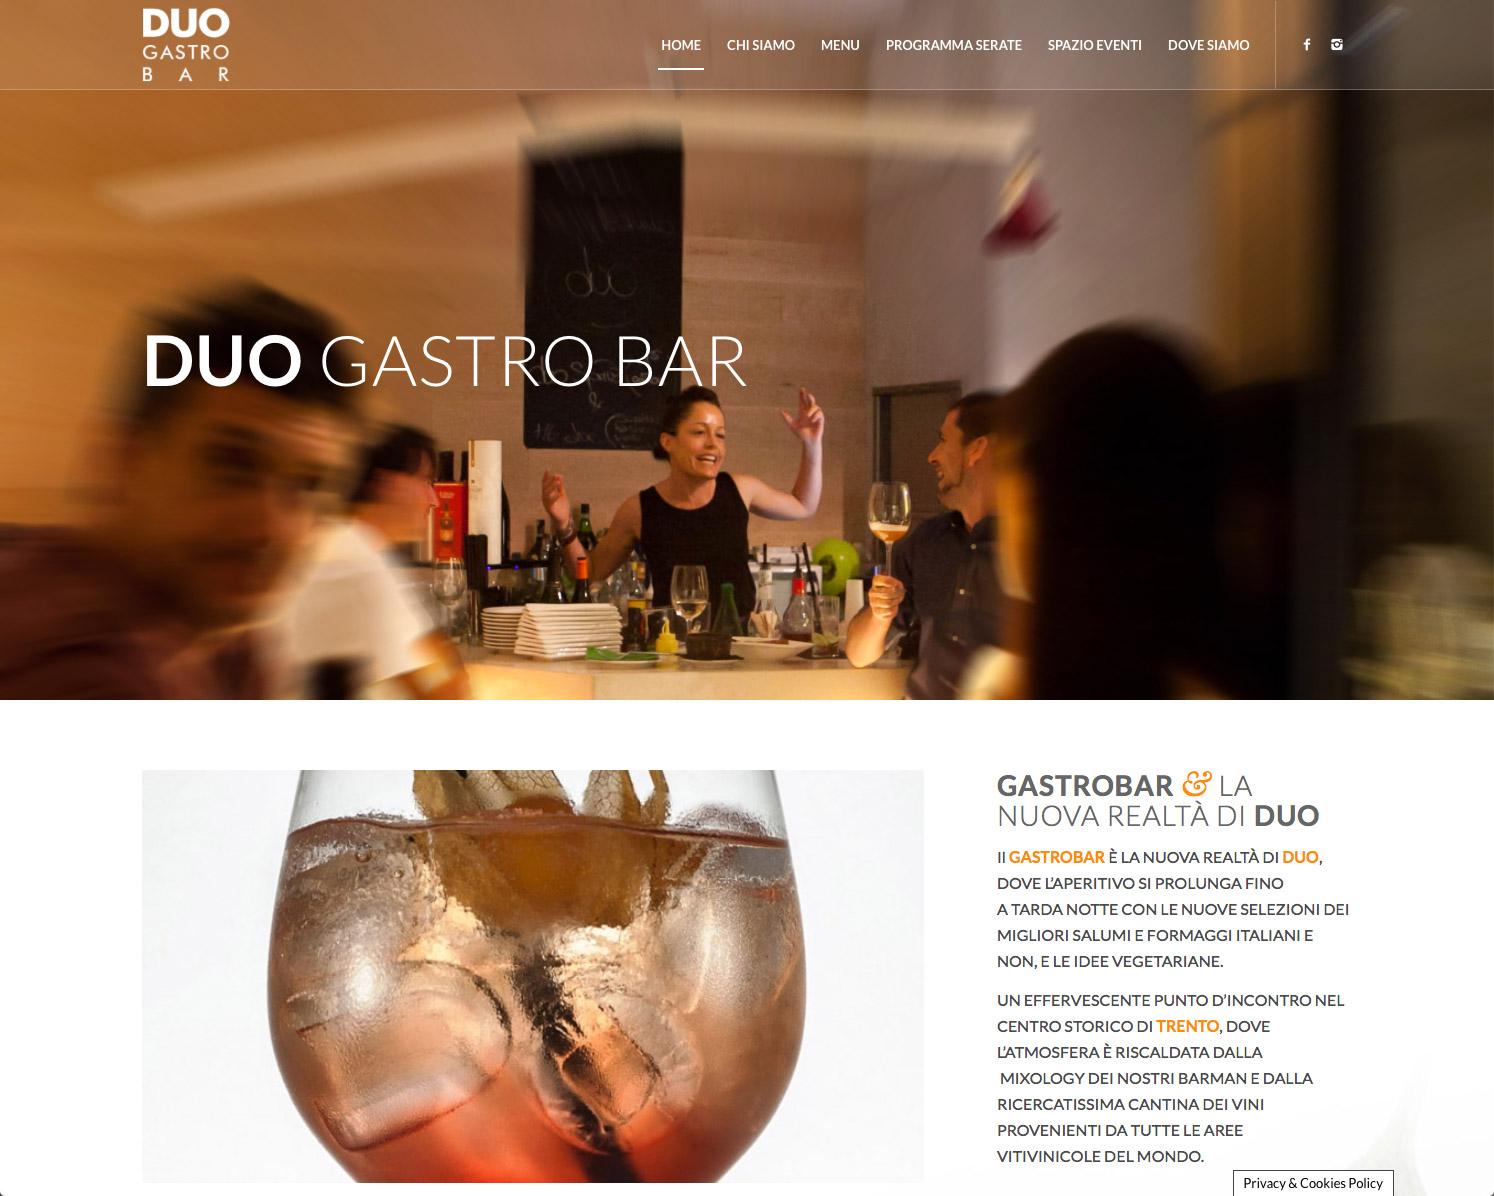 Duo Gastrobar a Trento